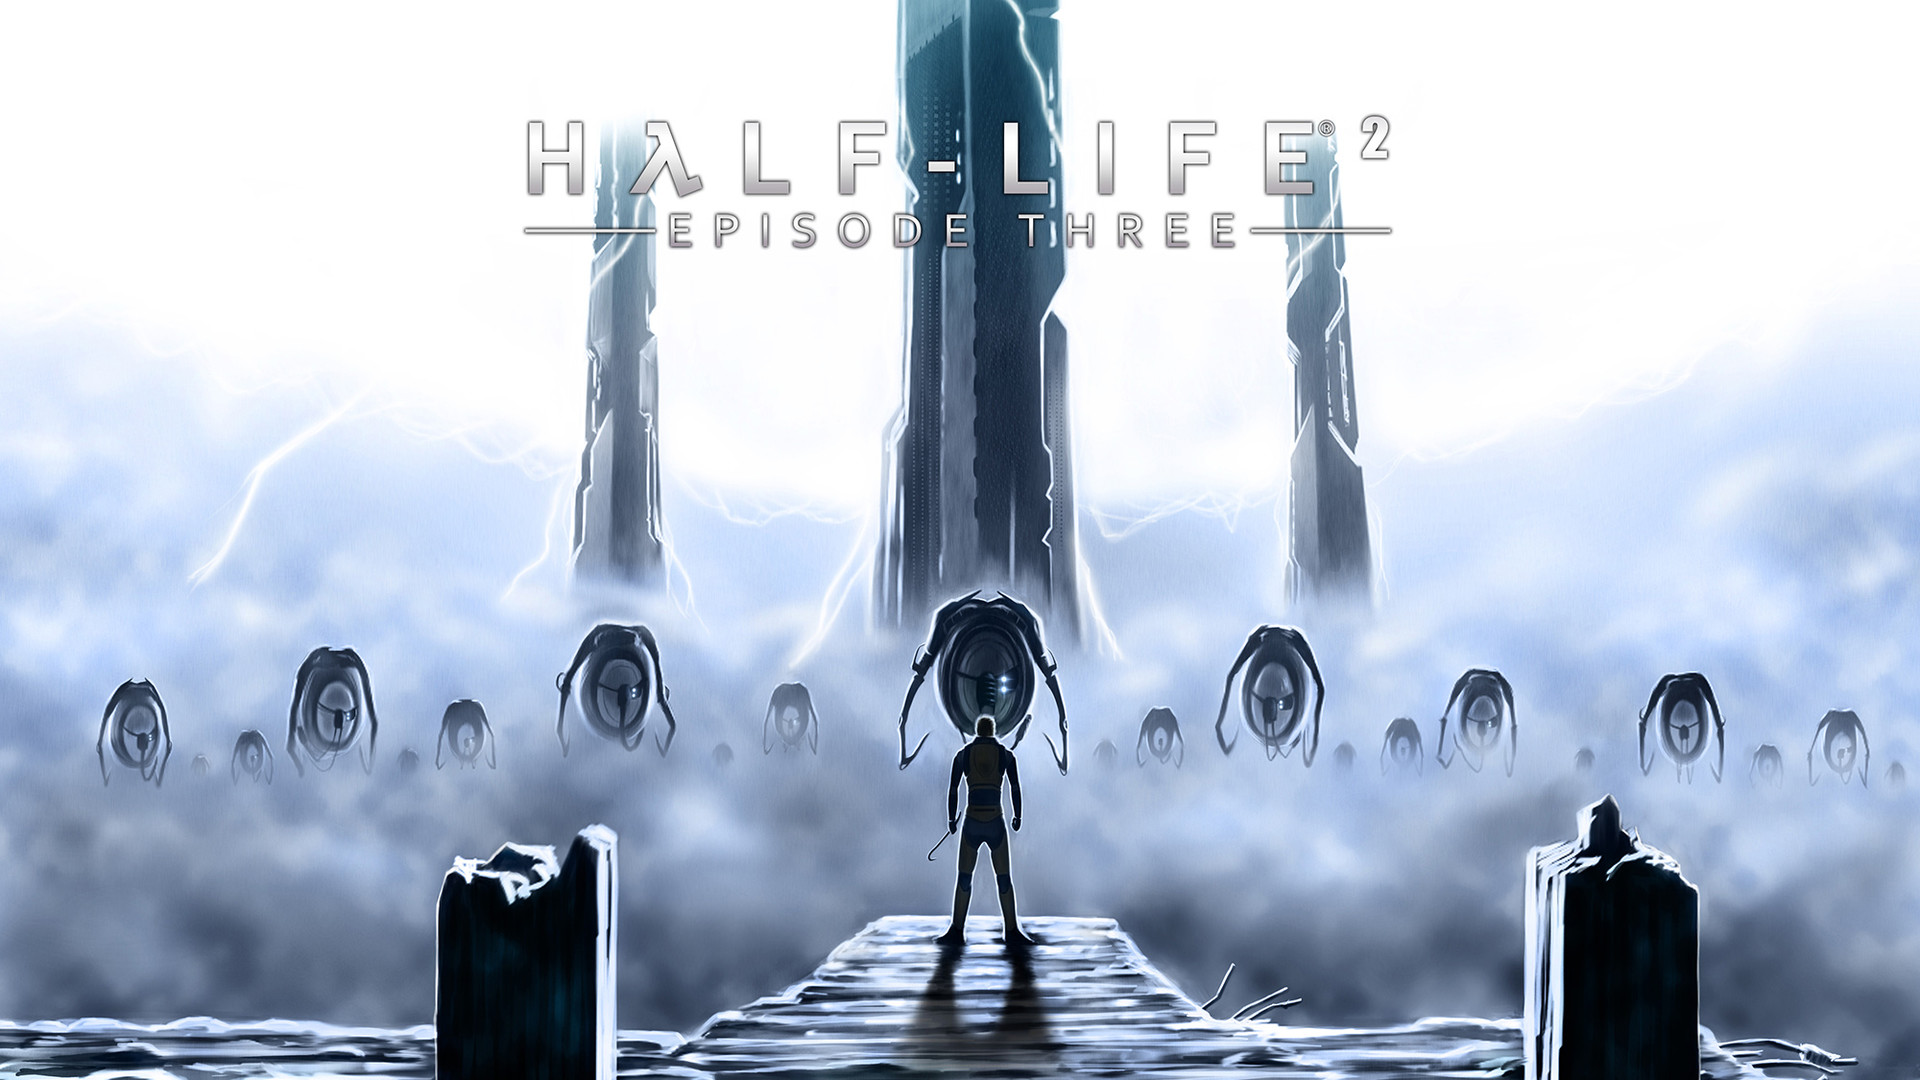 Half-Life 2 Full HD Wallpaper